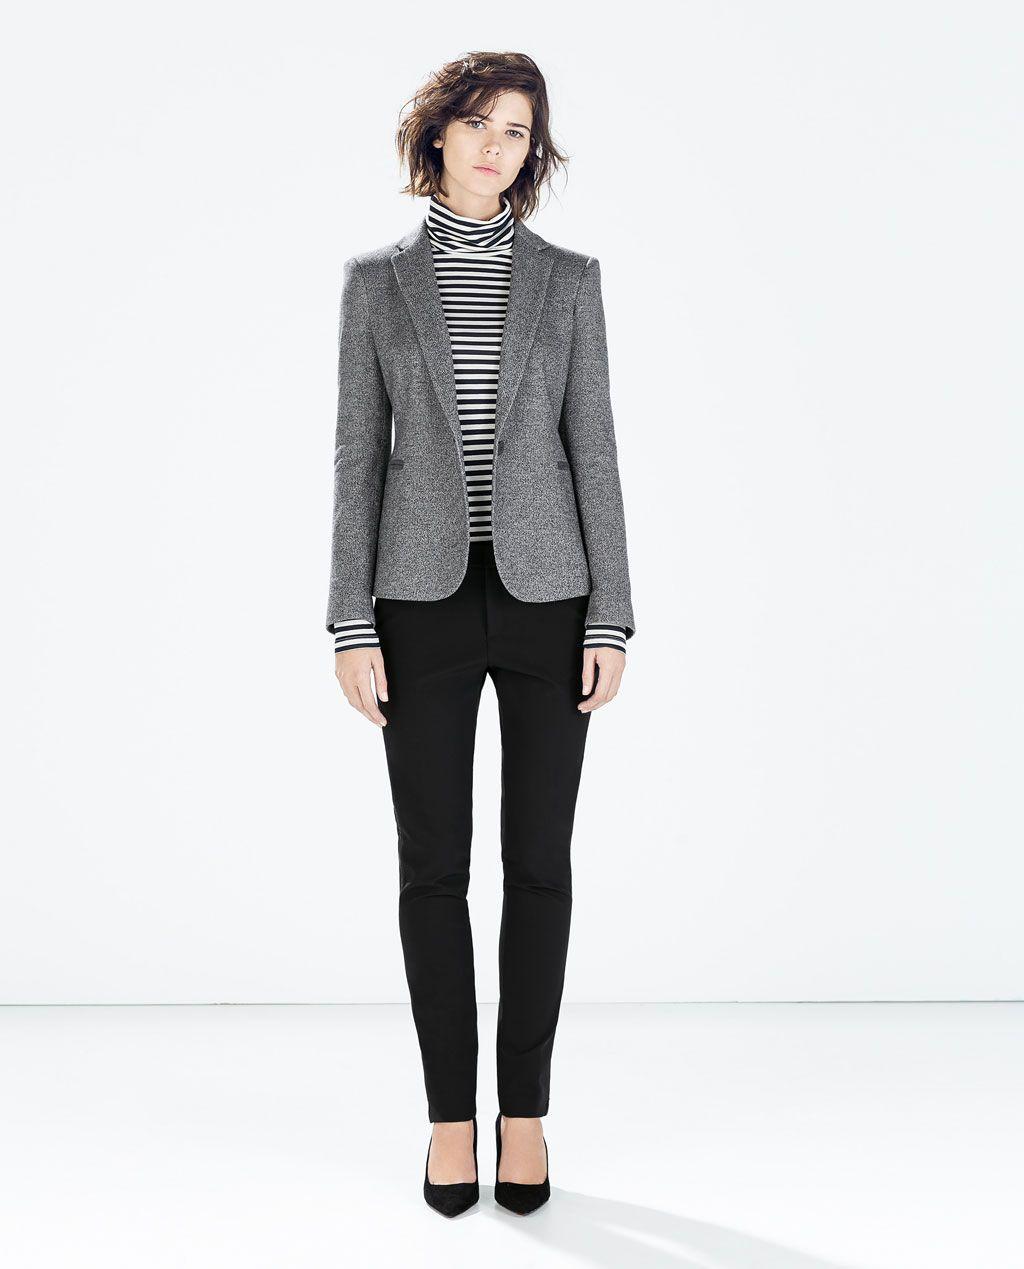 Blazer España Style Mujer Coderas Julia's Zara Felpa Chaquetas rwxBaqrR